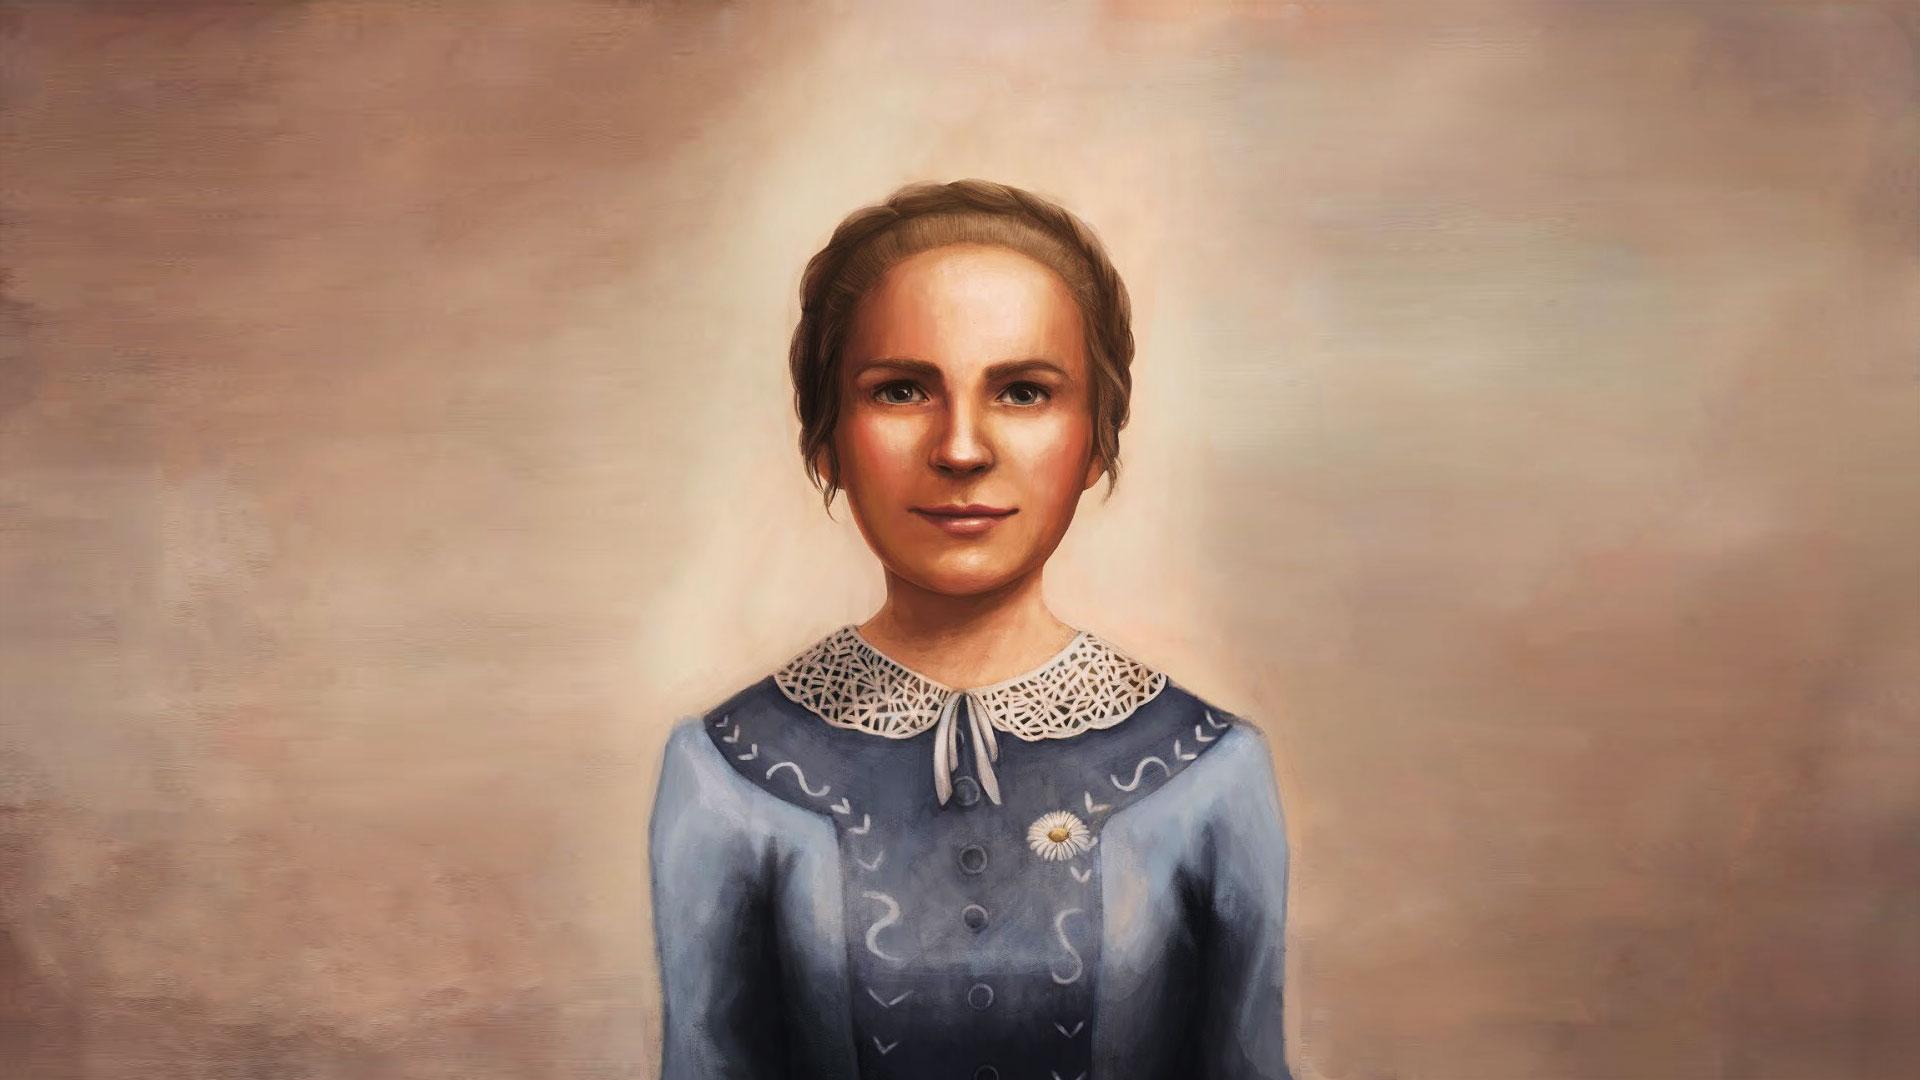 Anka Kolesarova